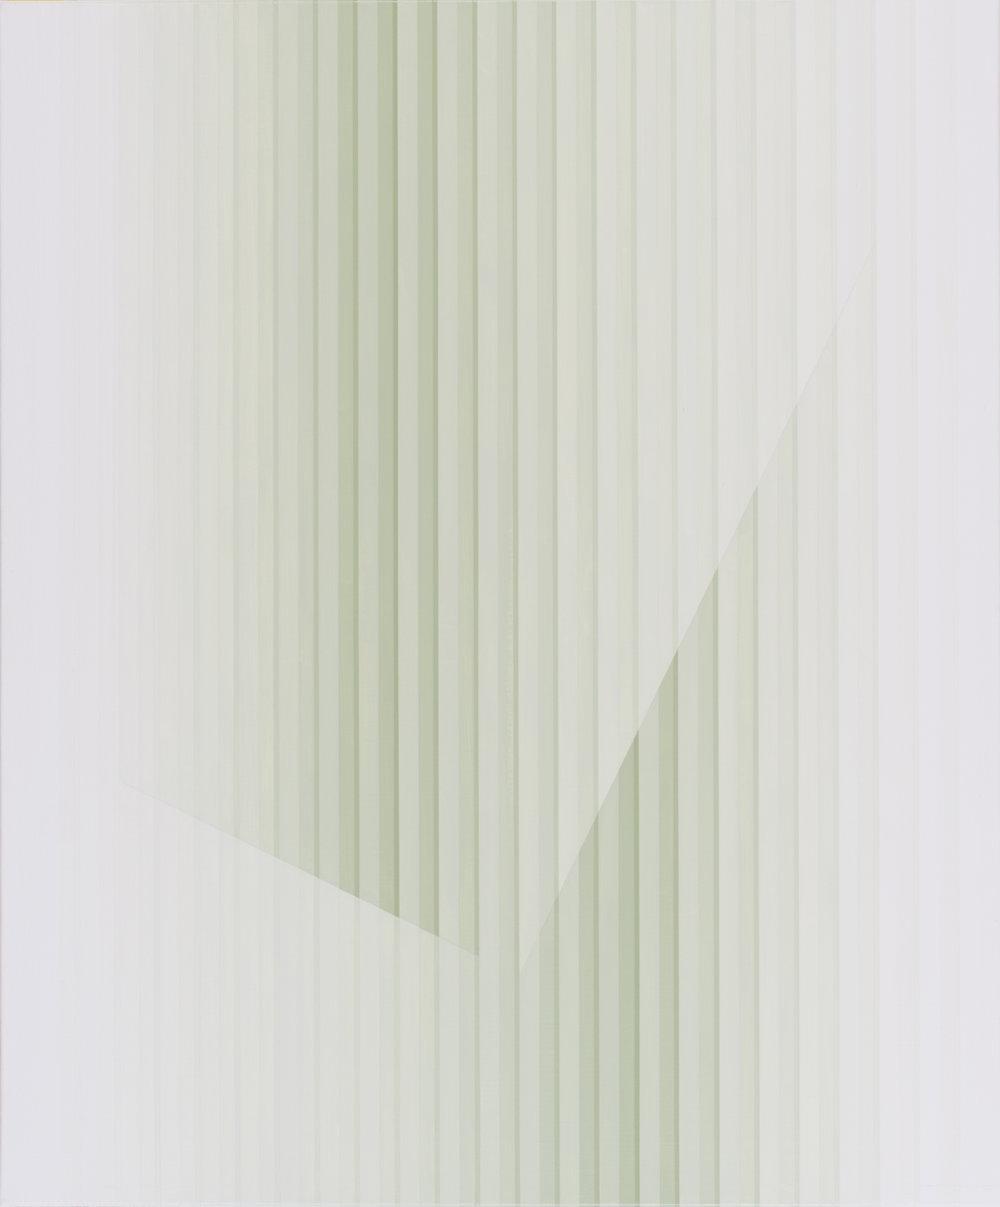 Miok Chung,  Transition 1617 ,72.7x60.6cm, acrylic on canvas, 2016